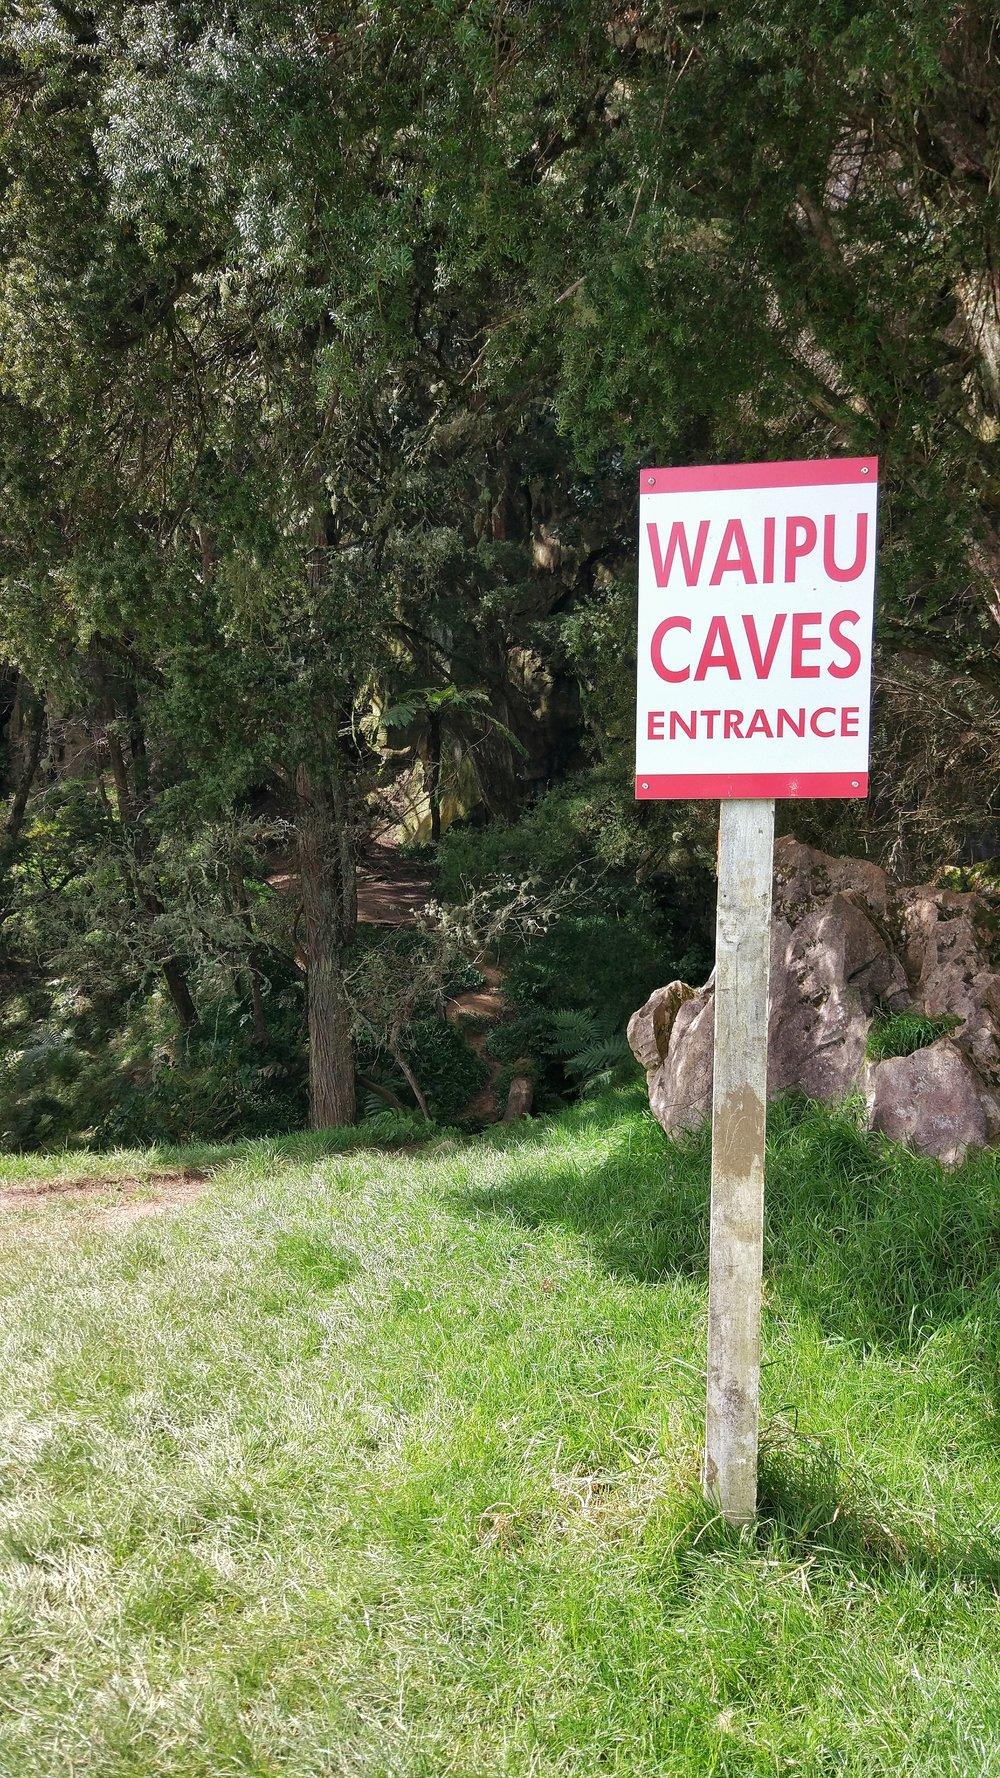 20170910_Northland_Whangarei_Waipu_Cave_glowworms_entrance.jpeg